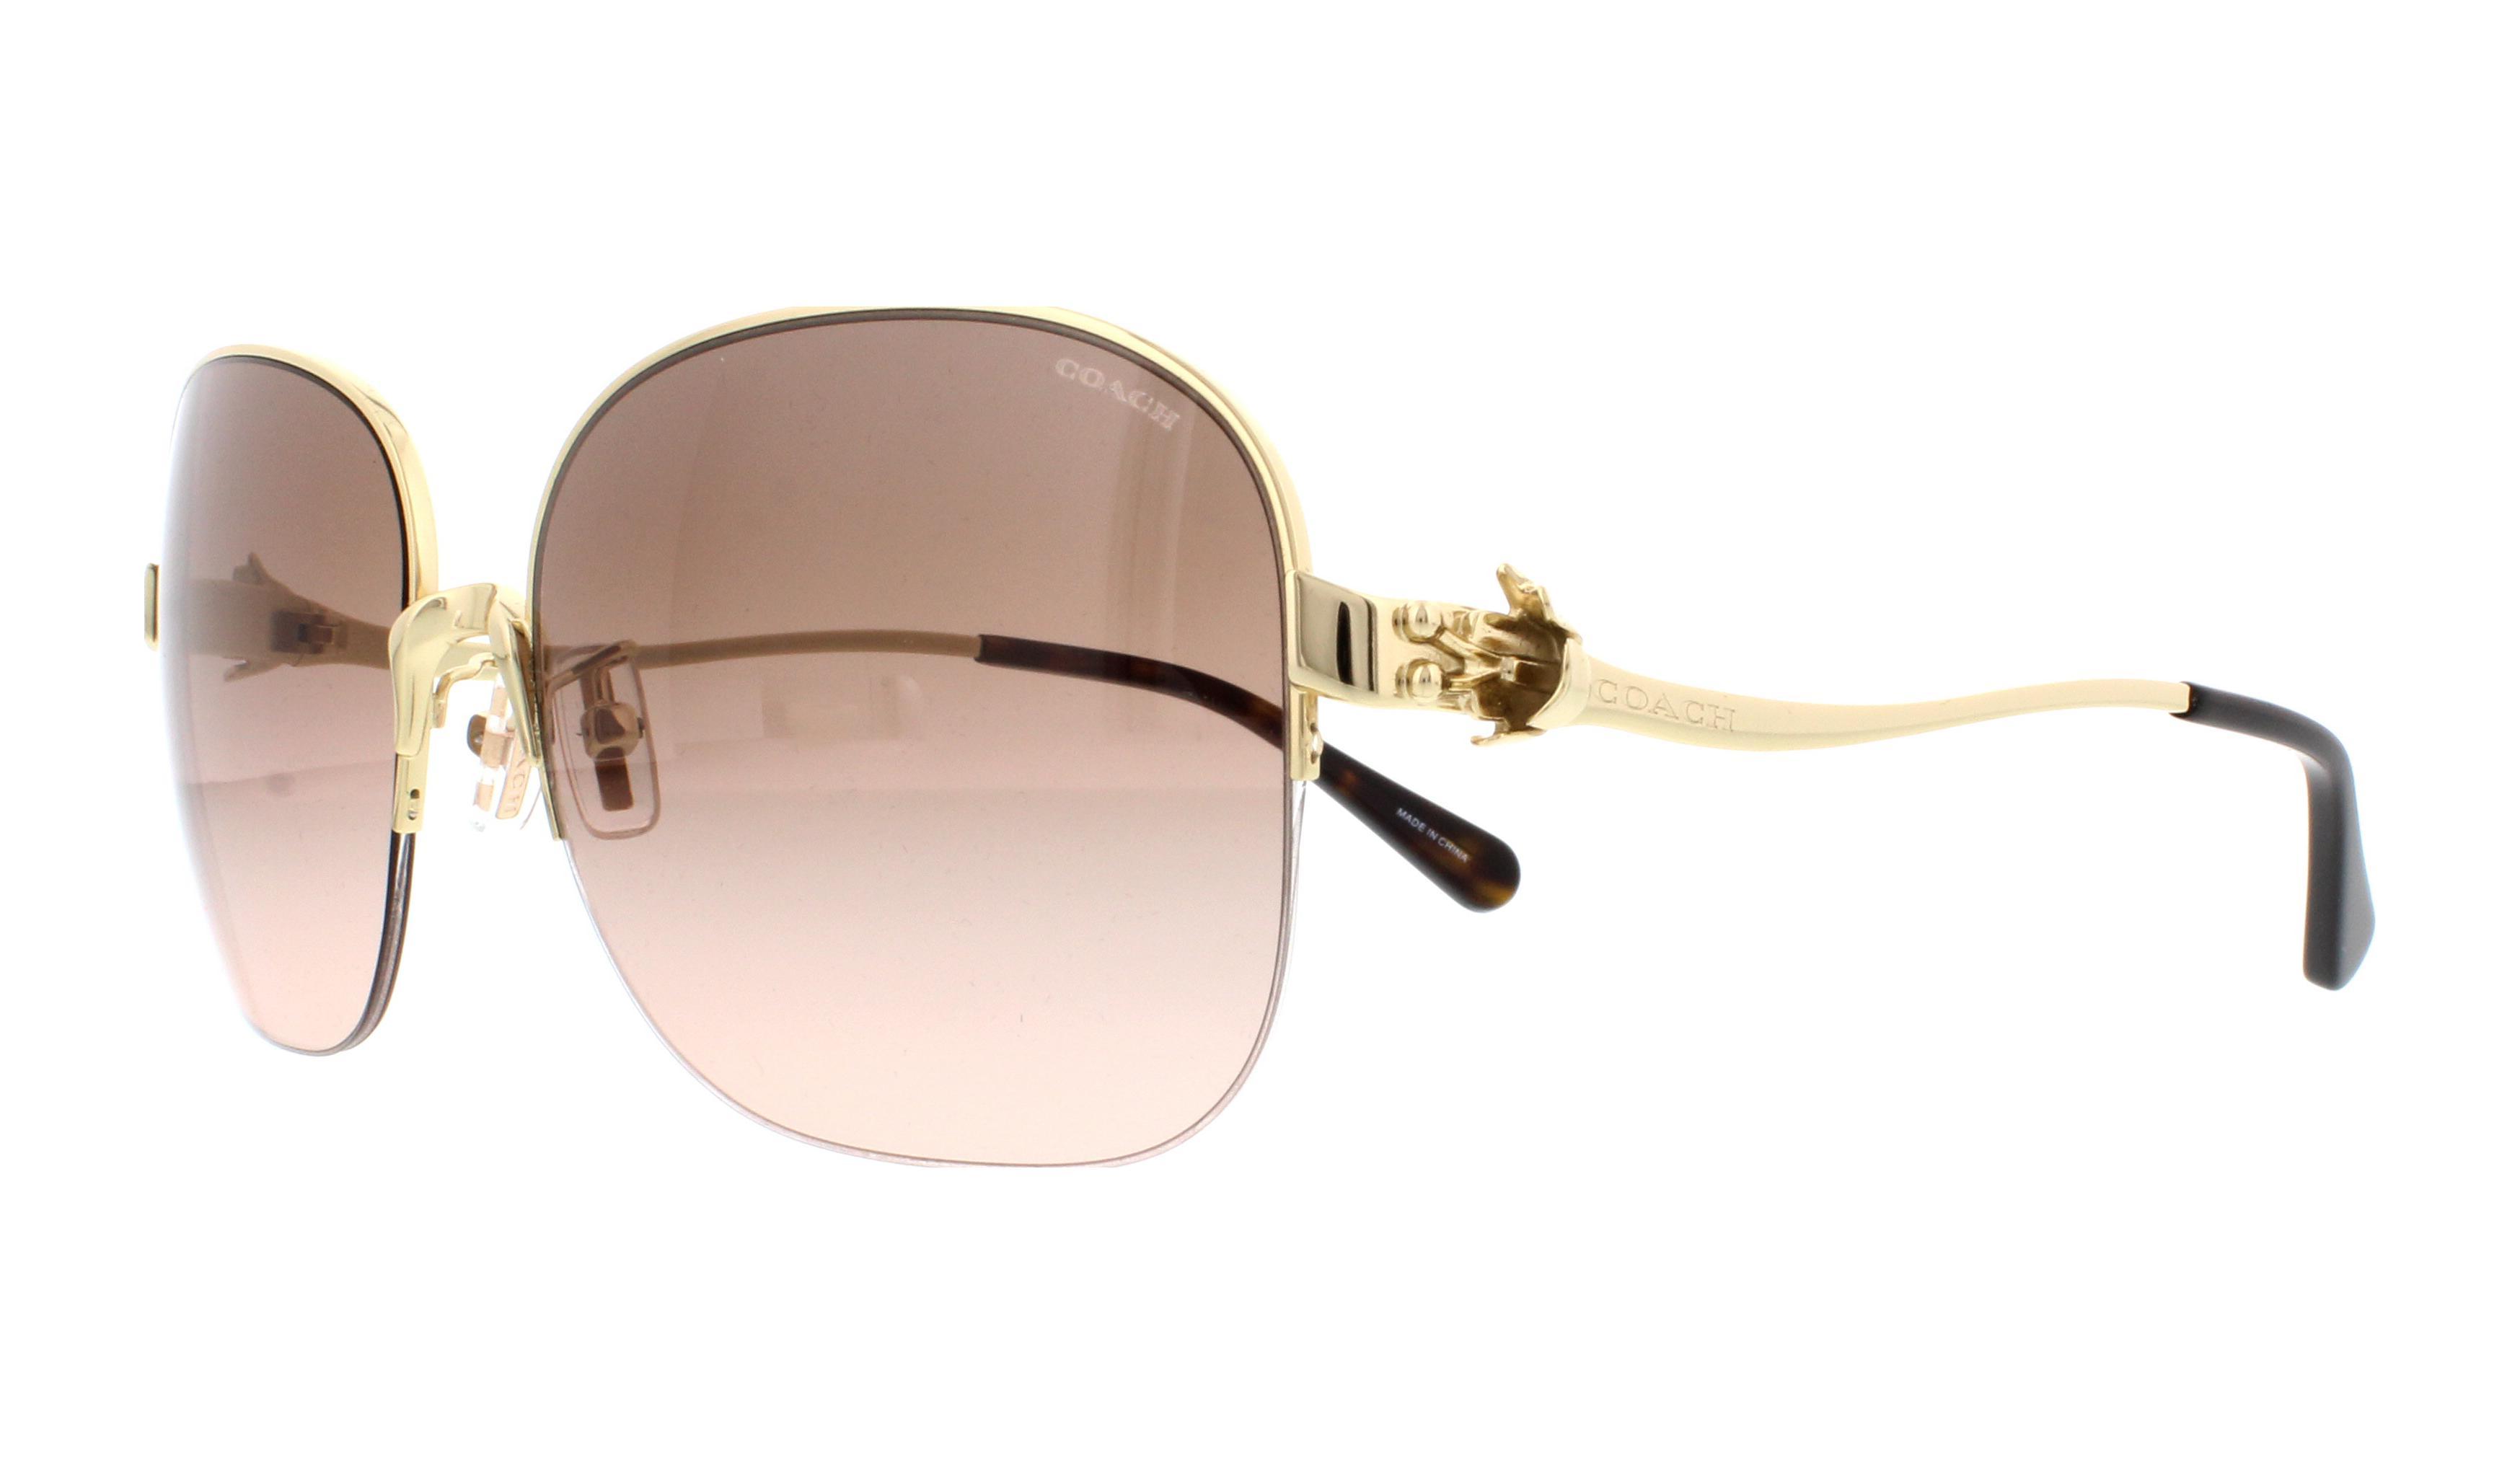 a0cac5c111 ... where can i buy coach sunglasses hc7068 l1609 929311 light gold dark  tortoise 58mm 31c02 6e83e